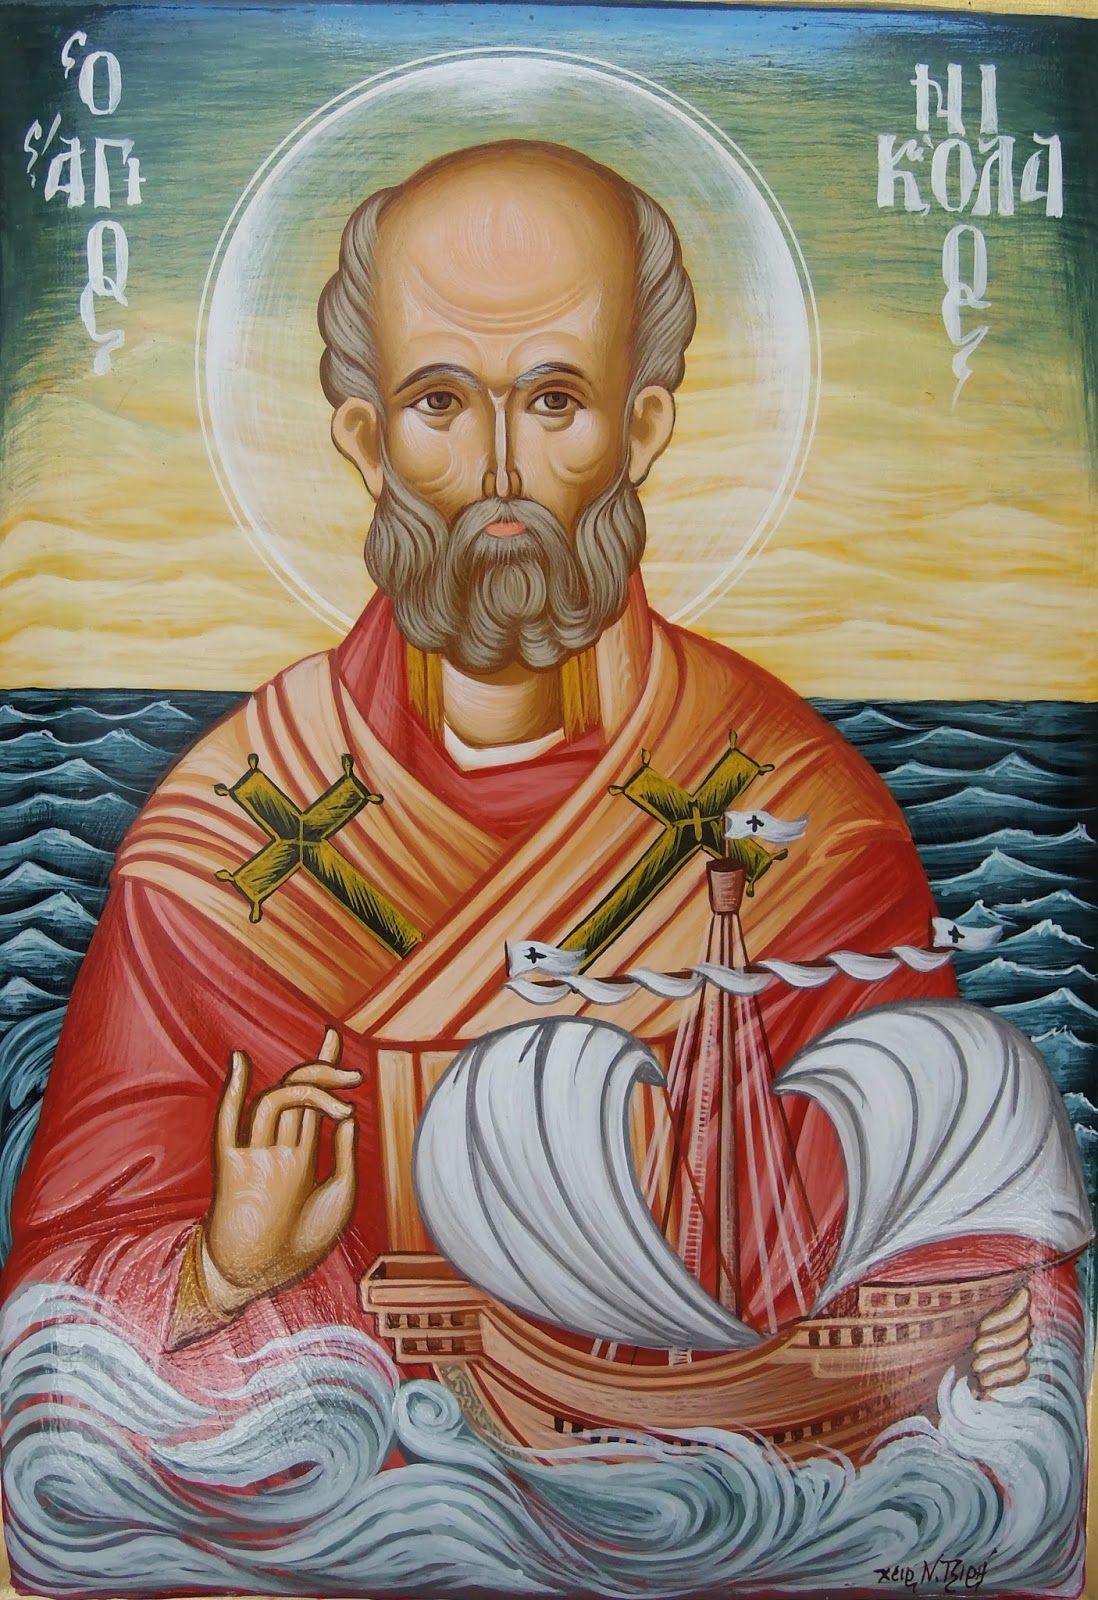 L' Italia in Grecia : Άγιος Νικόλαος, η διαδρομή των Ιερών ...